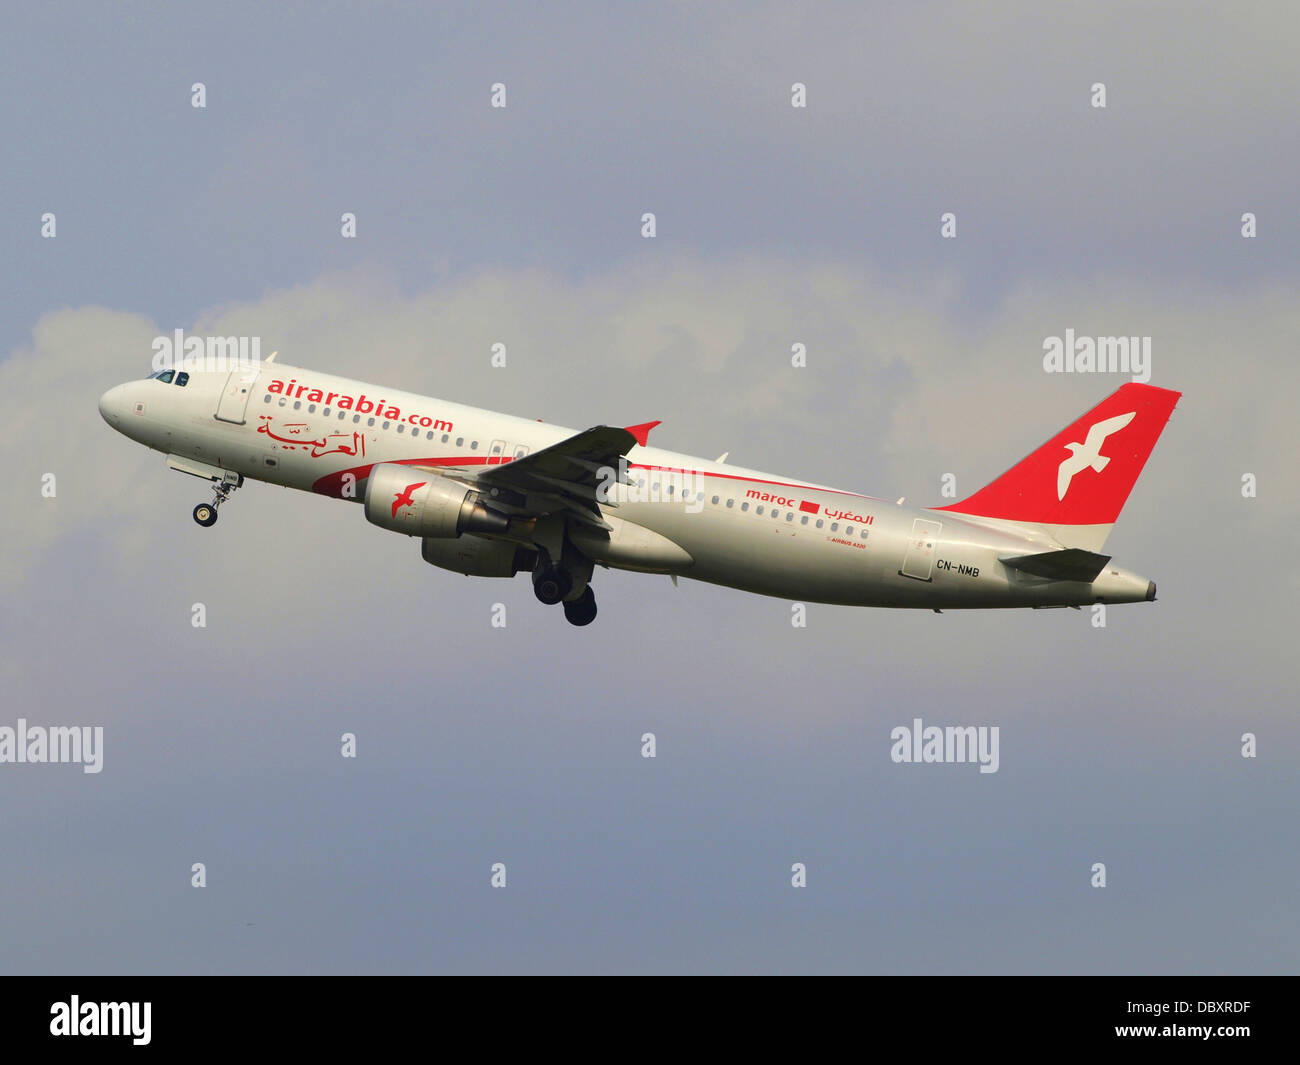 CN-NMB Air Arabia Maroc Airbus A320-214 - cn 3833 take-off 14july2013 3 - Stock Image